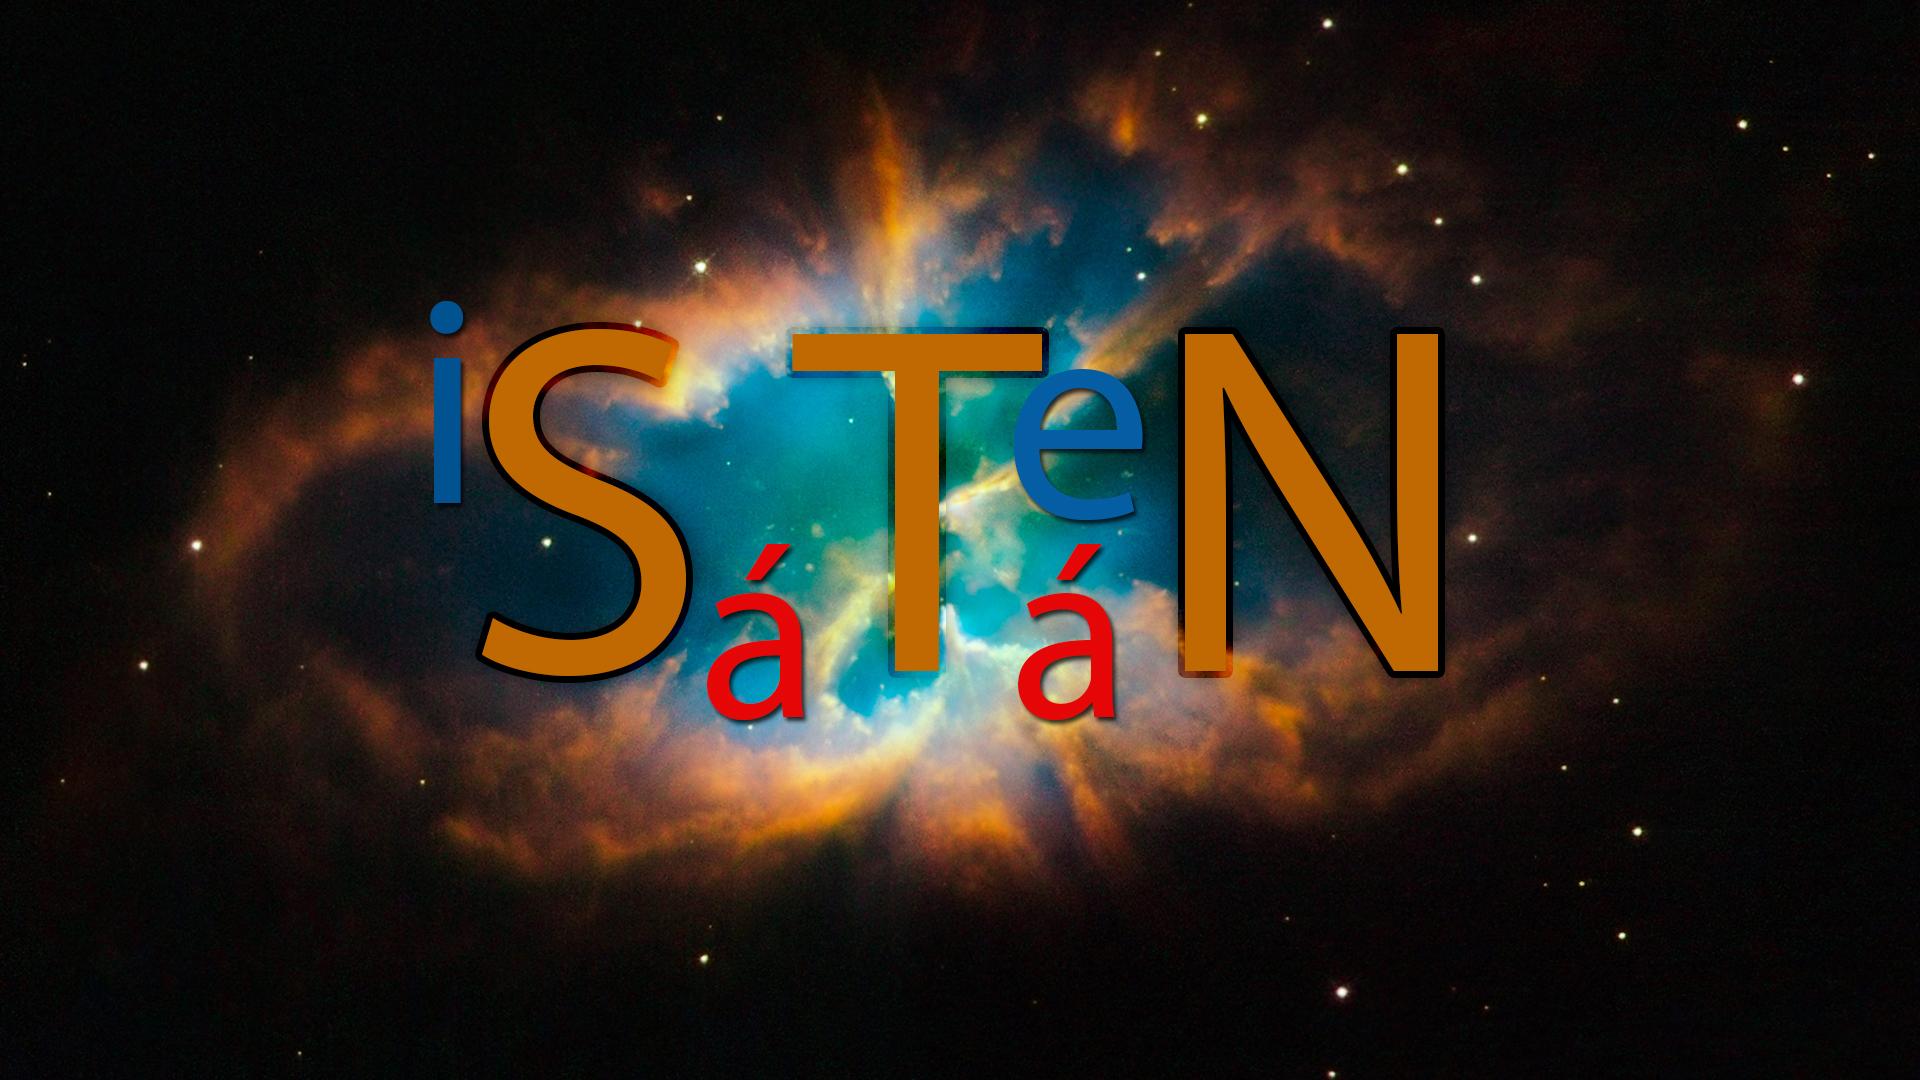 stn_isten-satan.jpg